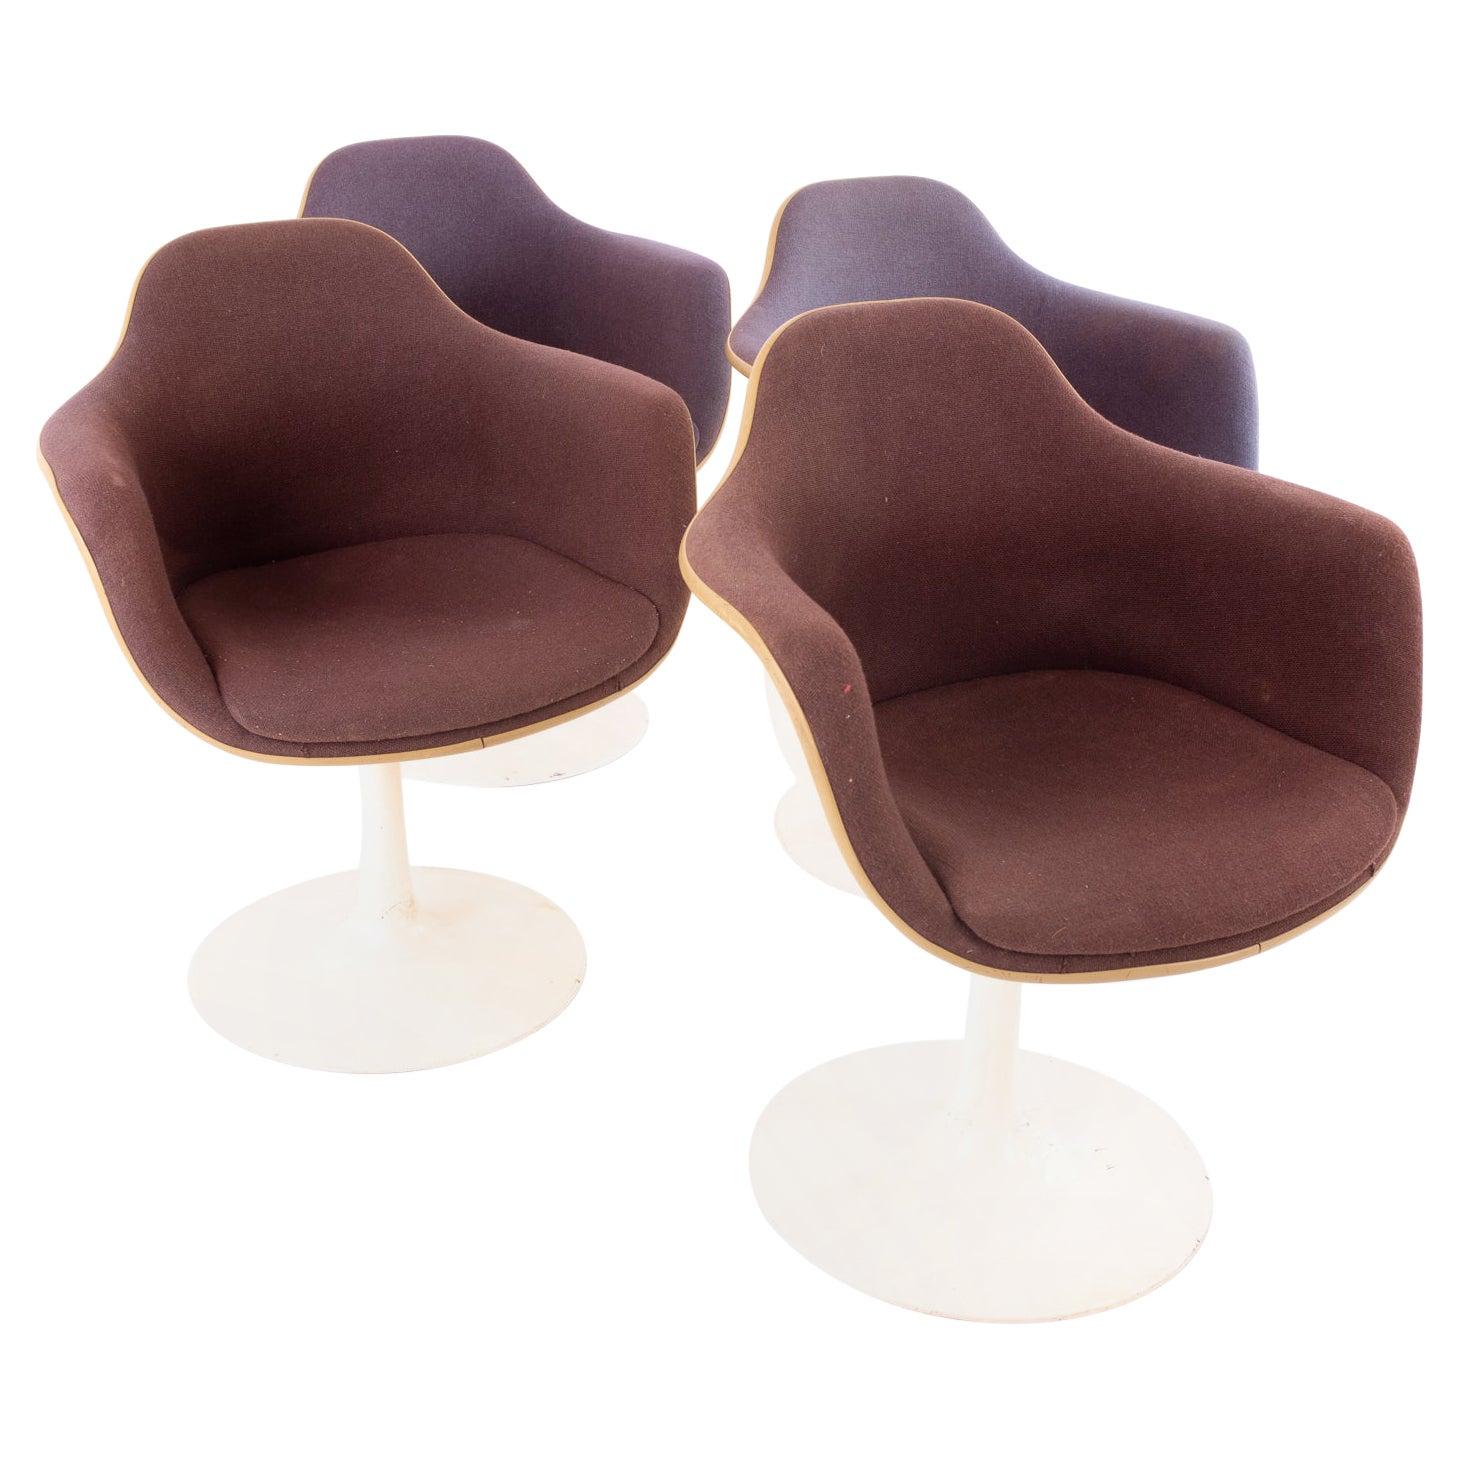 Eero Saarinen Style for Knoll Style MCM Tulip Dining Room Armchairs, Set of 4